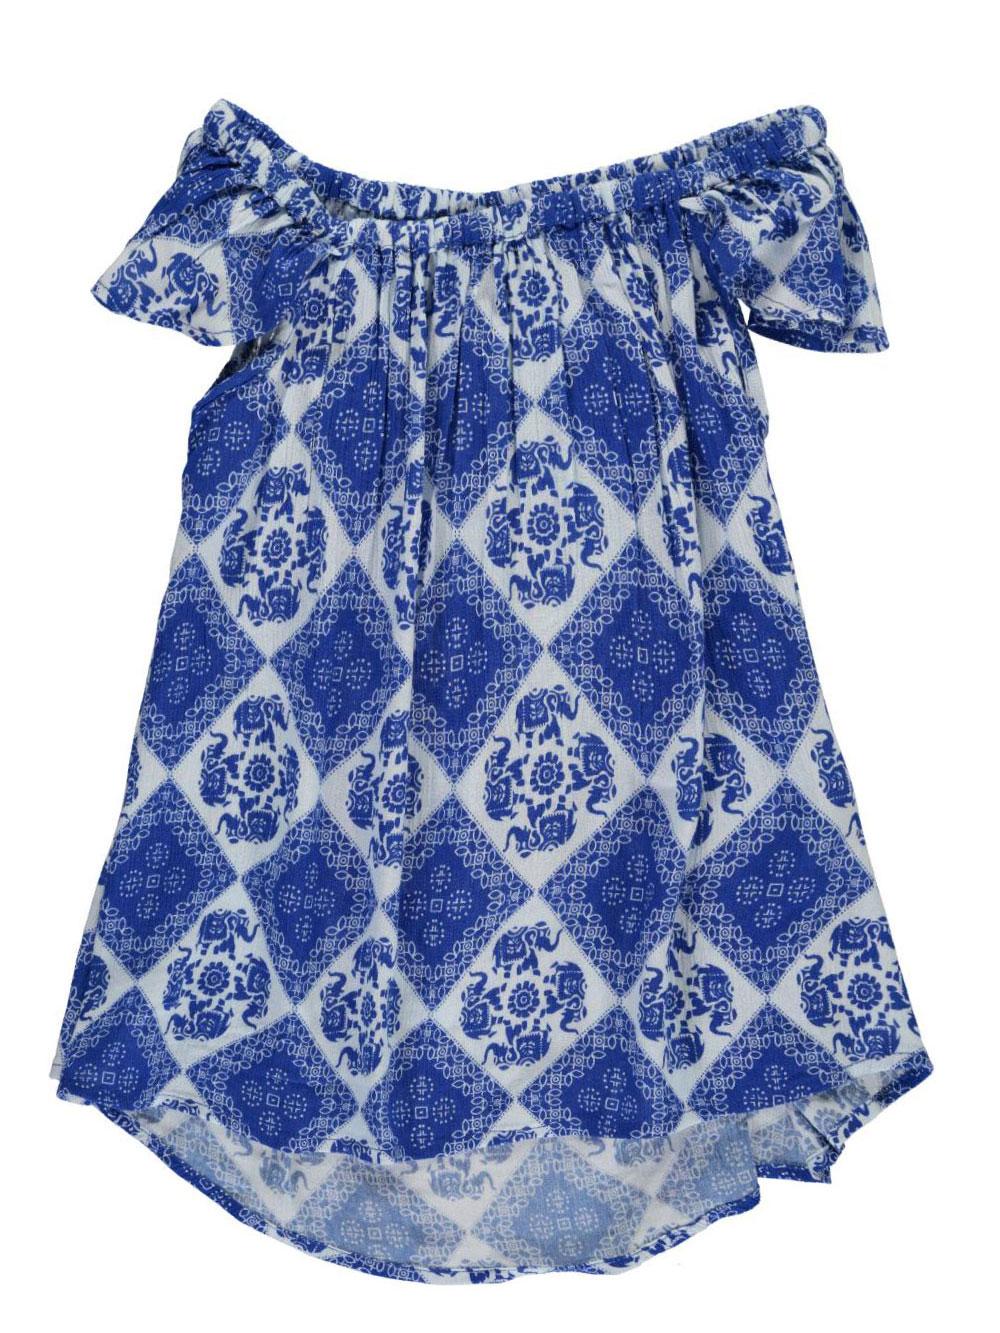 Image of Derek Heart Big Girls Elephant Tiles Top Sizes 7  16  blue 7  8